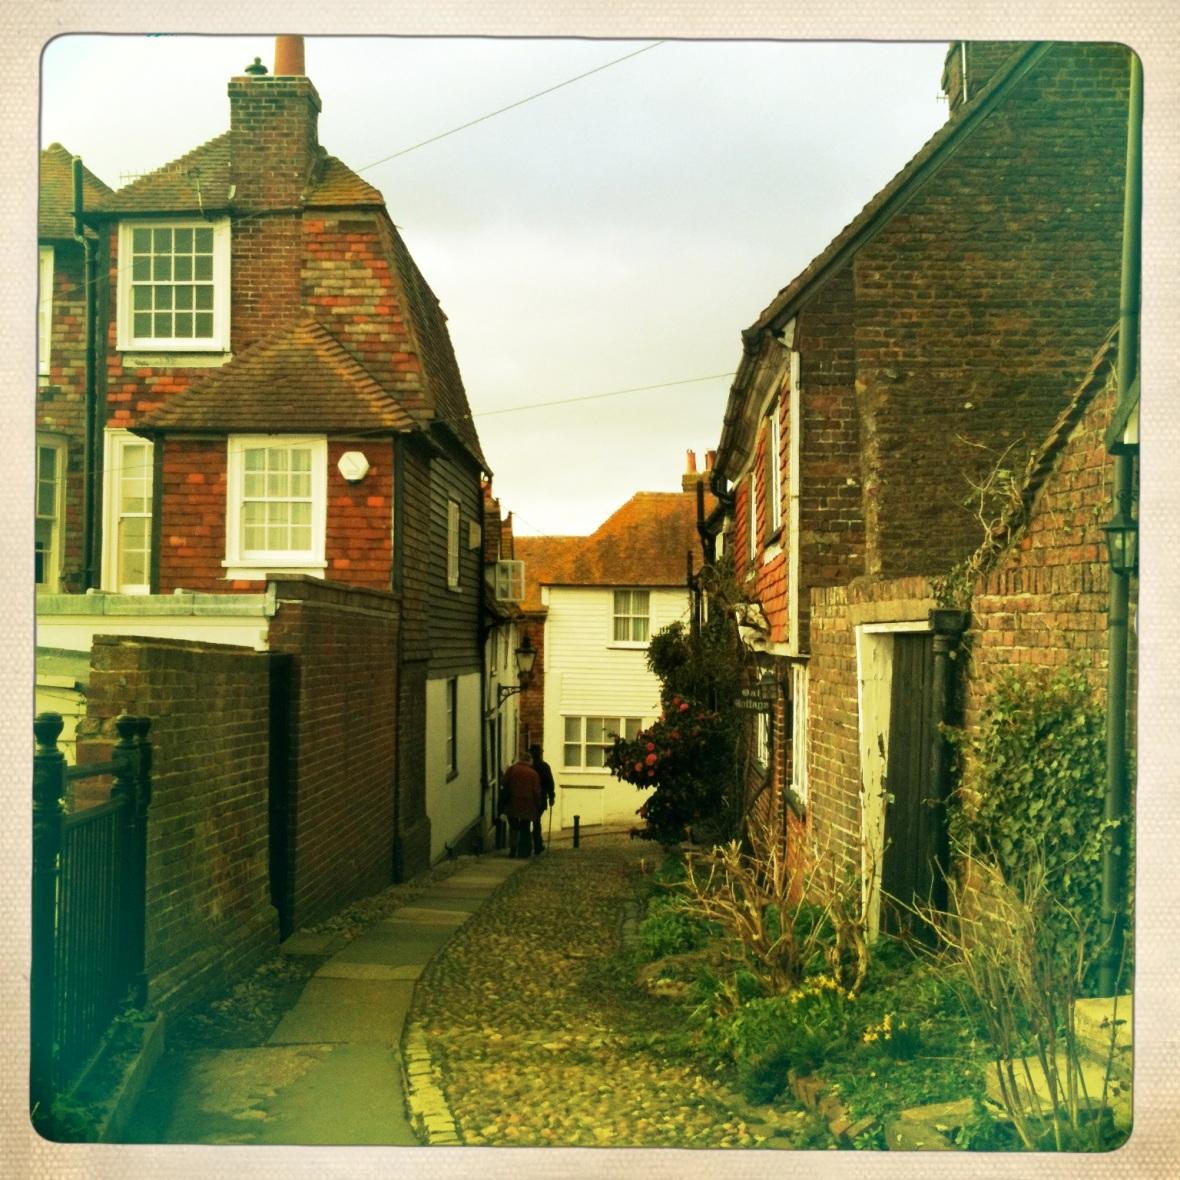 Rye, Sussex, England